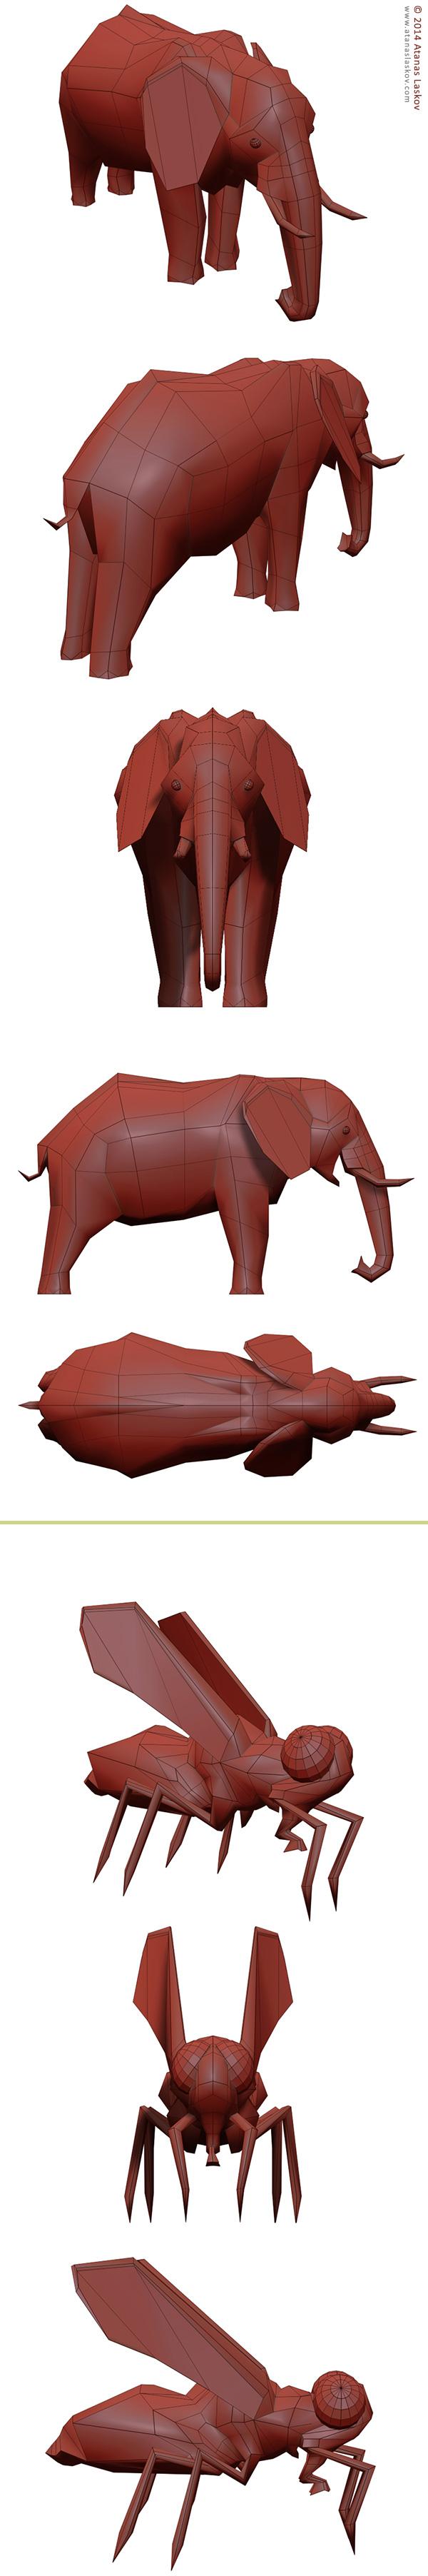 Laskov 3D Elephant and Fly